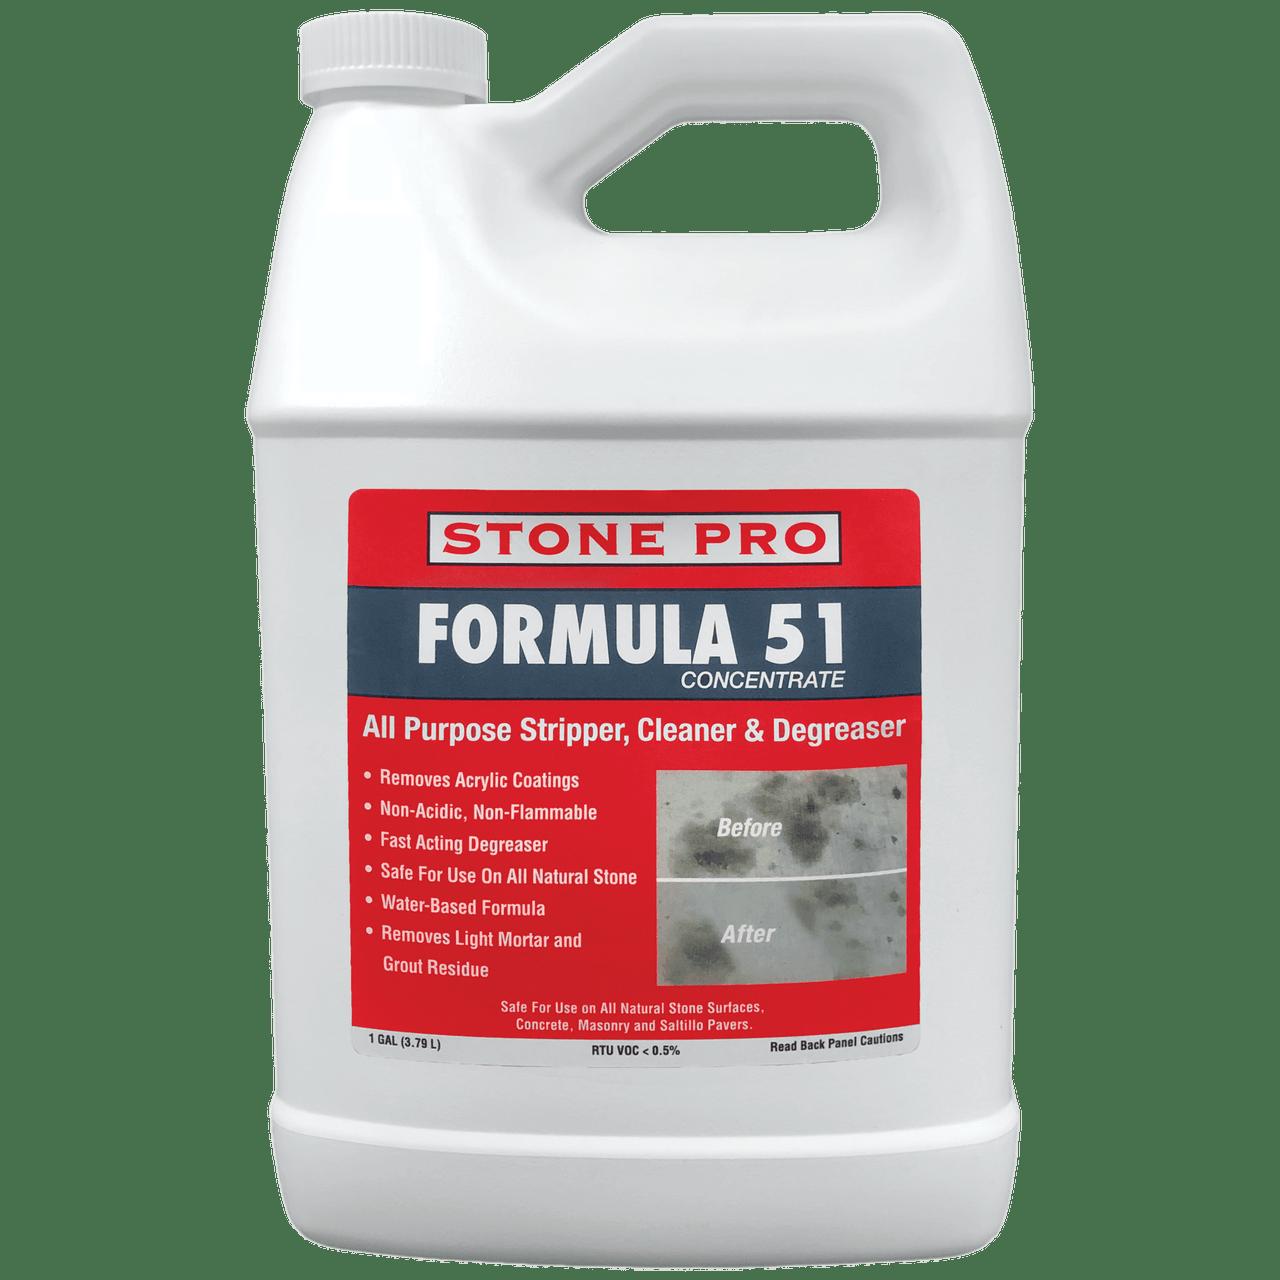 Concrete Stain Remover >> Stone Pro Formula 51 Stripper And Stain Remover